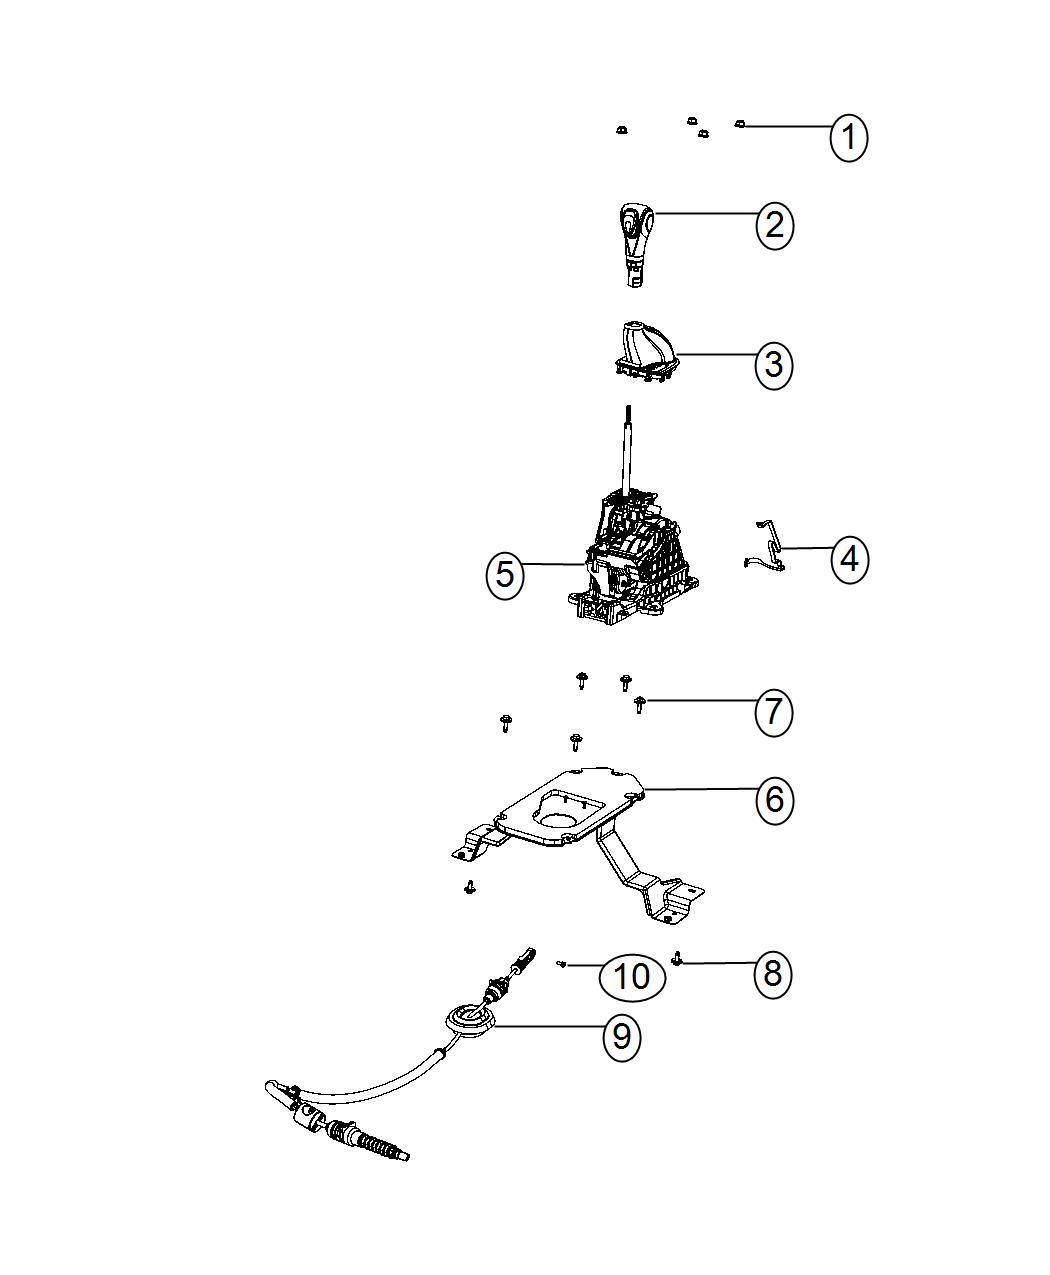 2016 Dodge Dart Plate. Transmission shifter. Gear